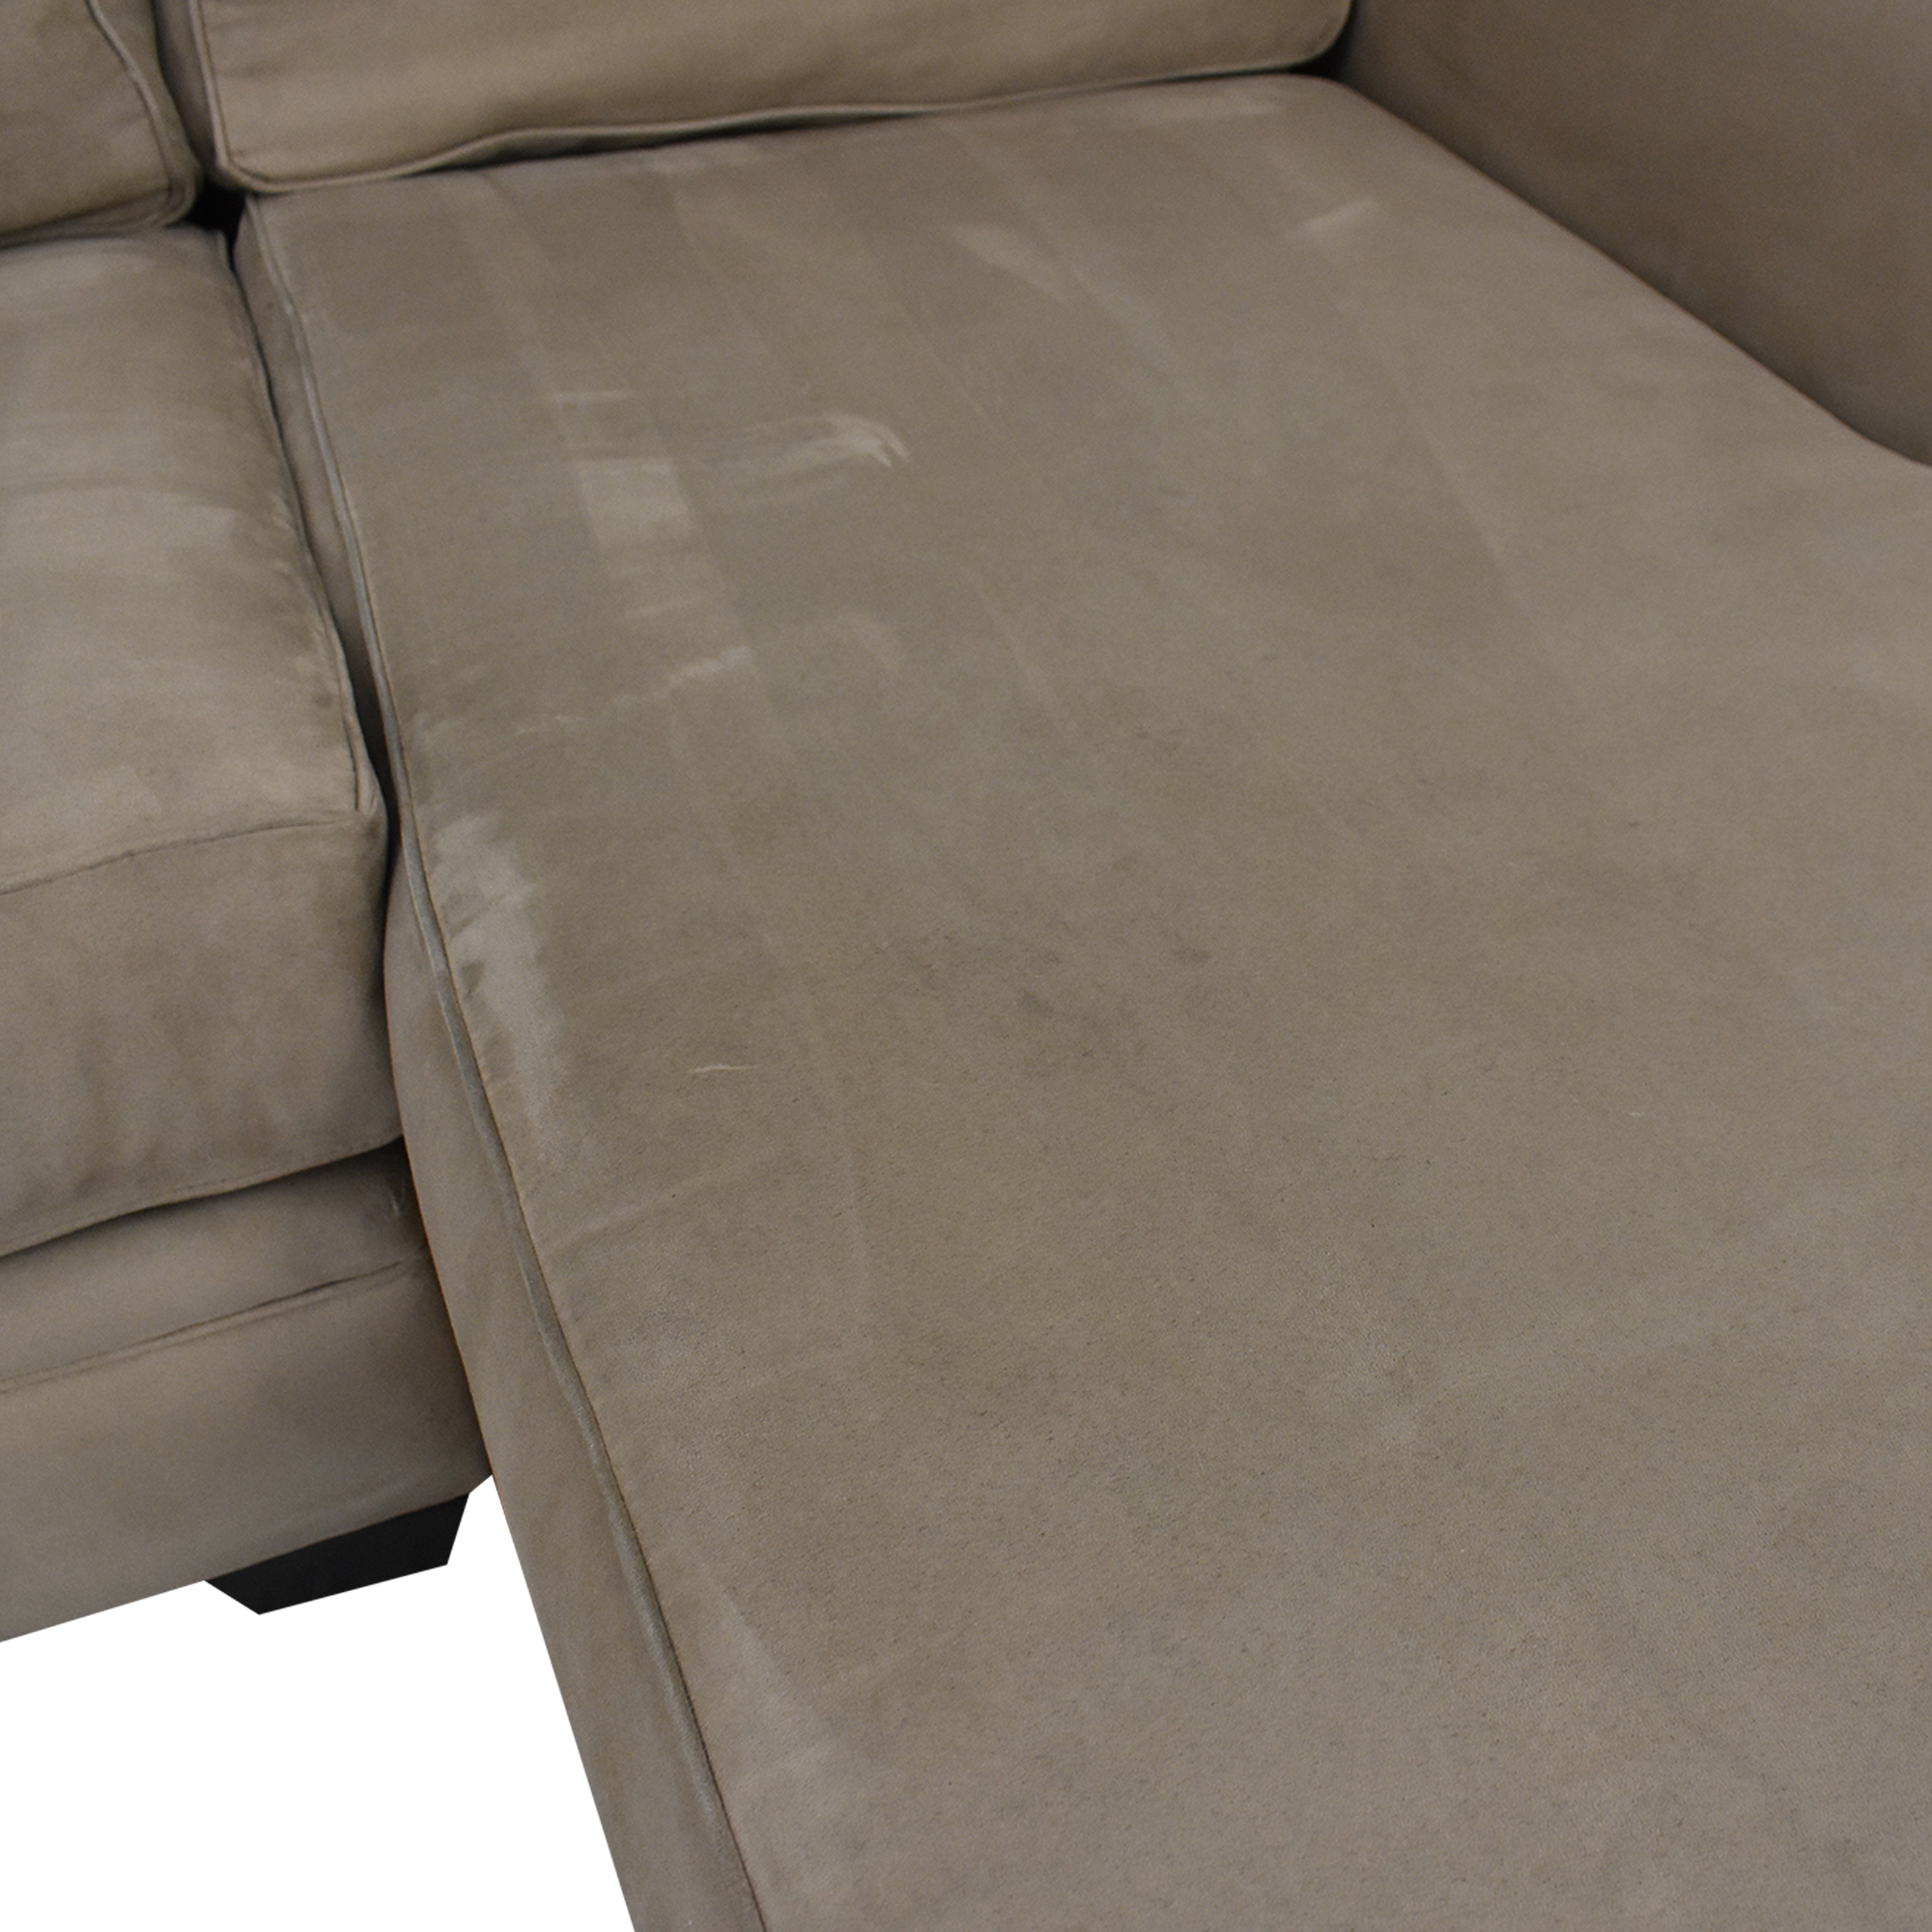 Macy's Jonathan Louis Chaise Sectional Sofa ma